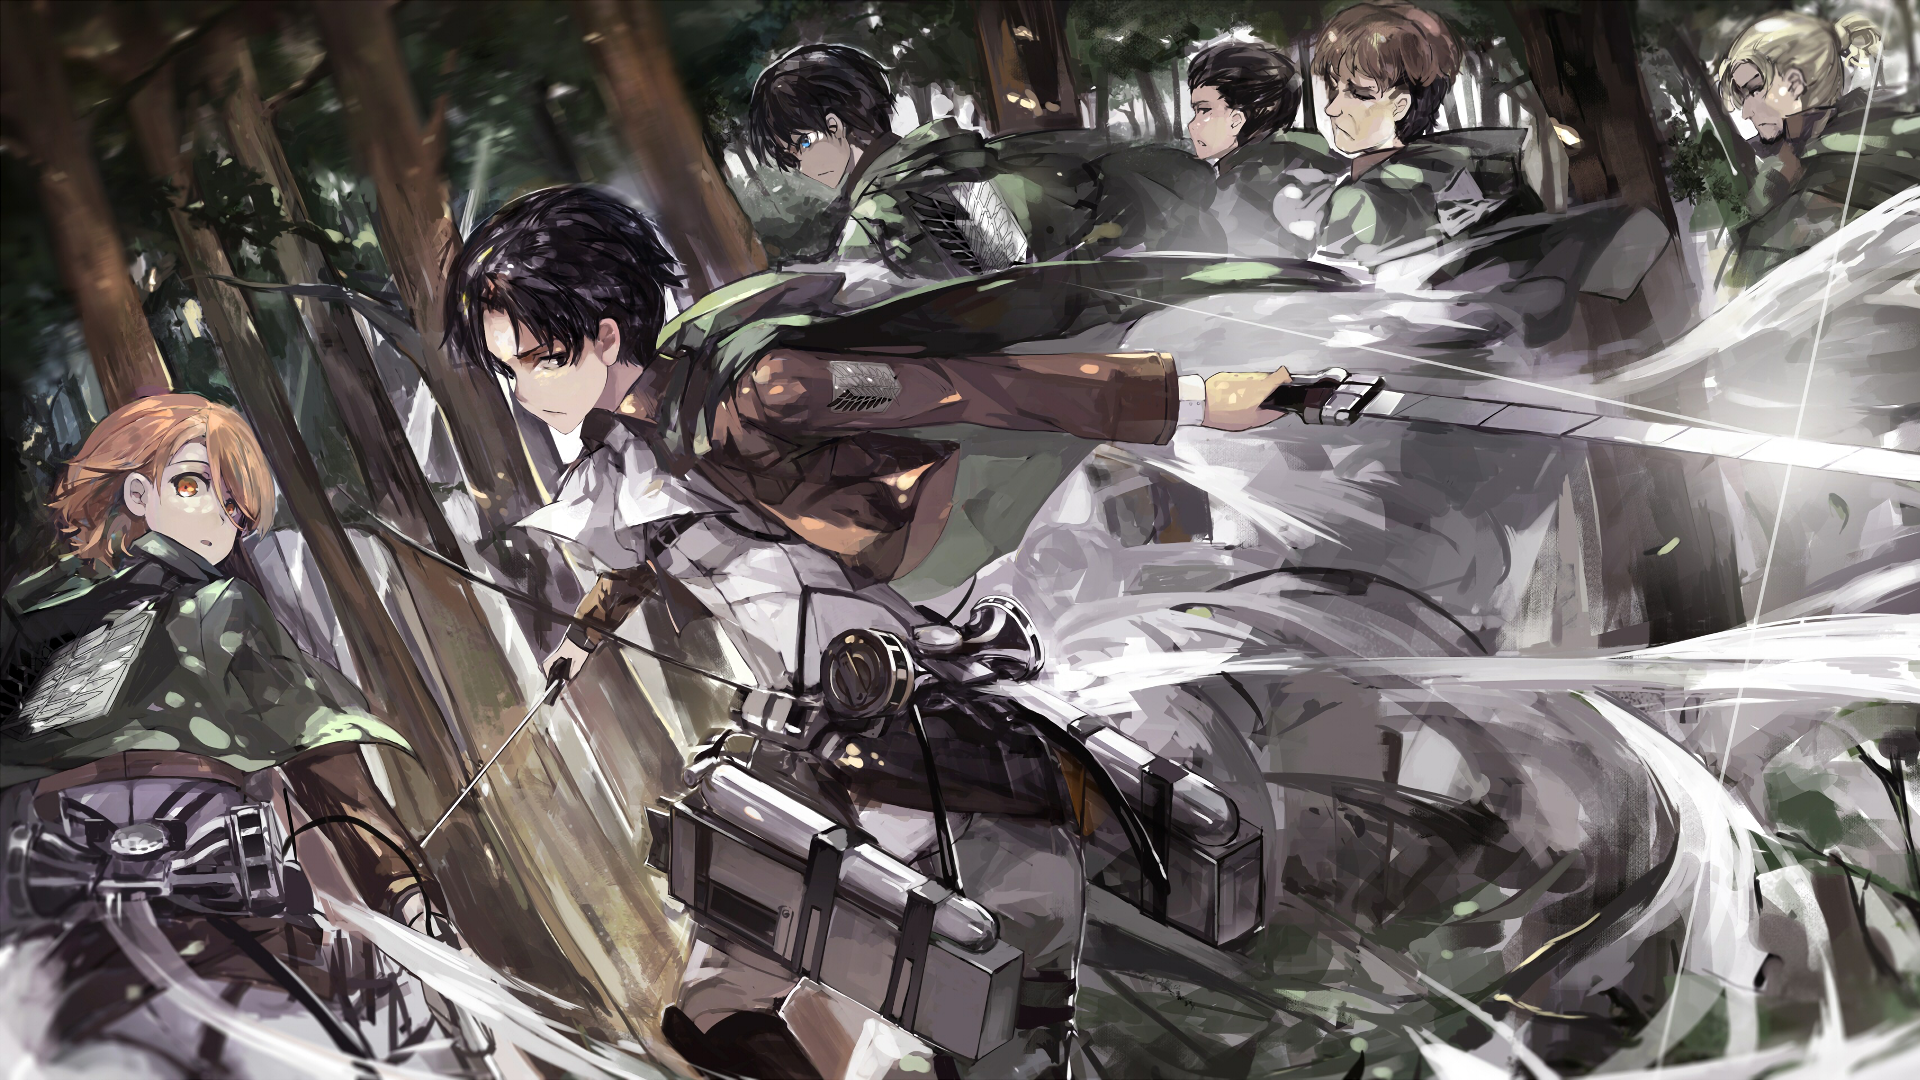 Anime - Attack On Titan  Levi Ackerman Eren Yeager Petra Ral Gunther Schultz Erd Gin Auruo Bossard Shingeki No Kyojin Wallpaper